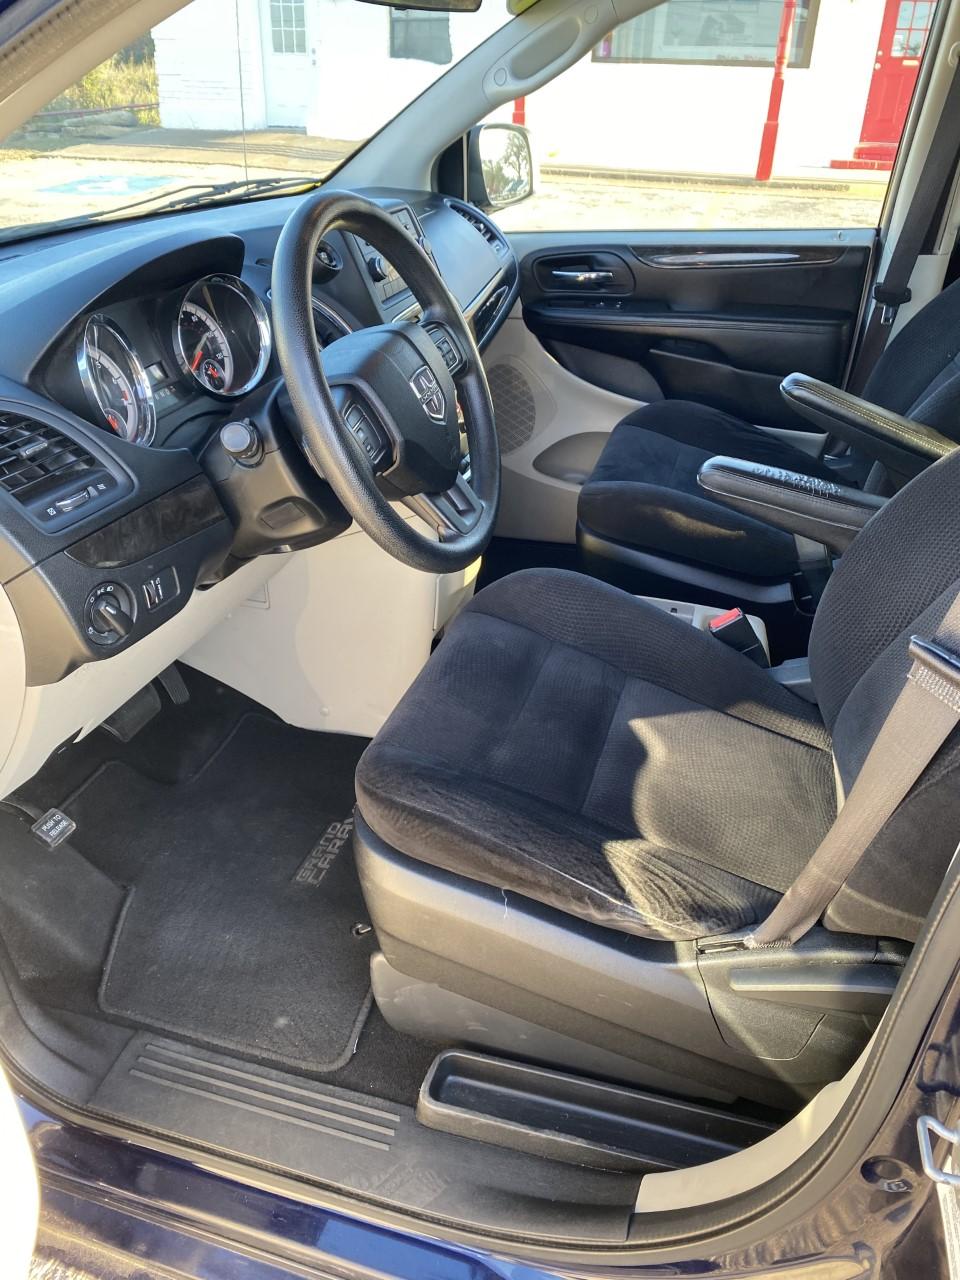 used vehicle - Passenger Van DODGE GRAND CARAVAN 2014